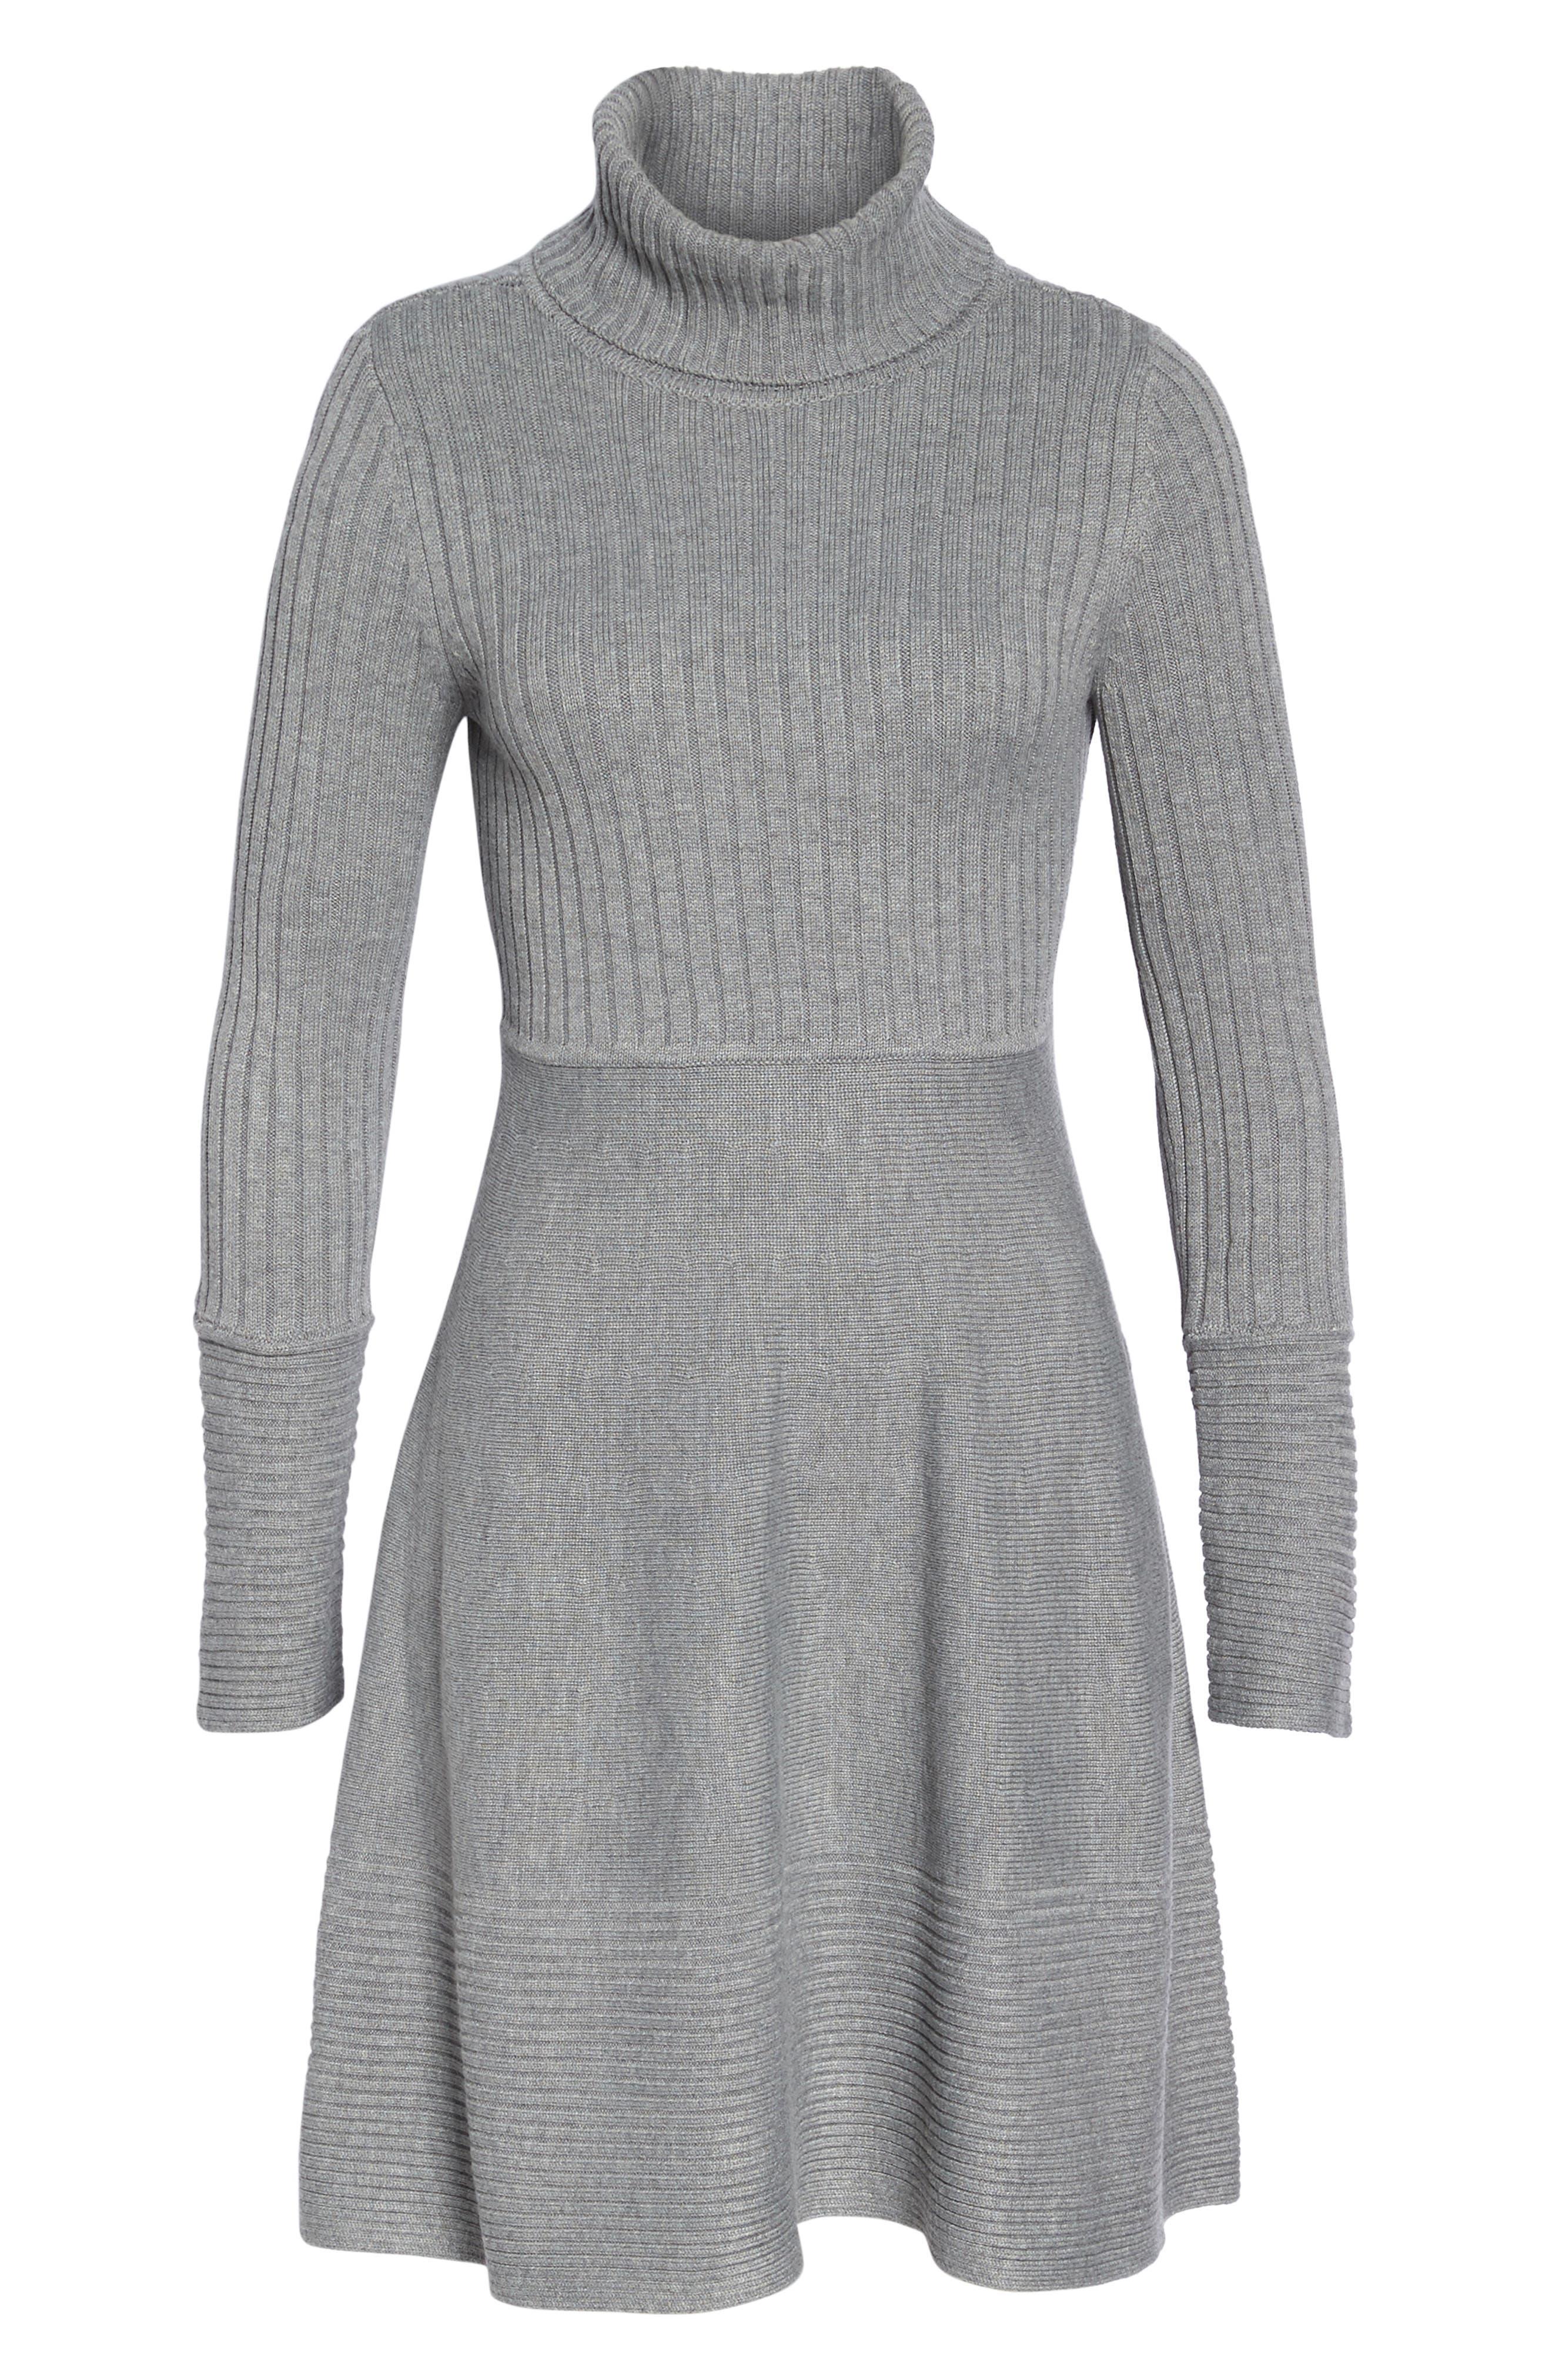 Turtleneck Sweater Dress,                             Alternate thumbnail 8, color,                             GREY